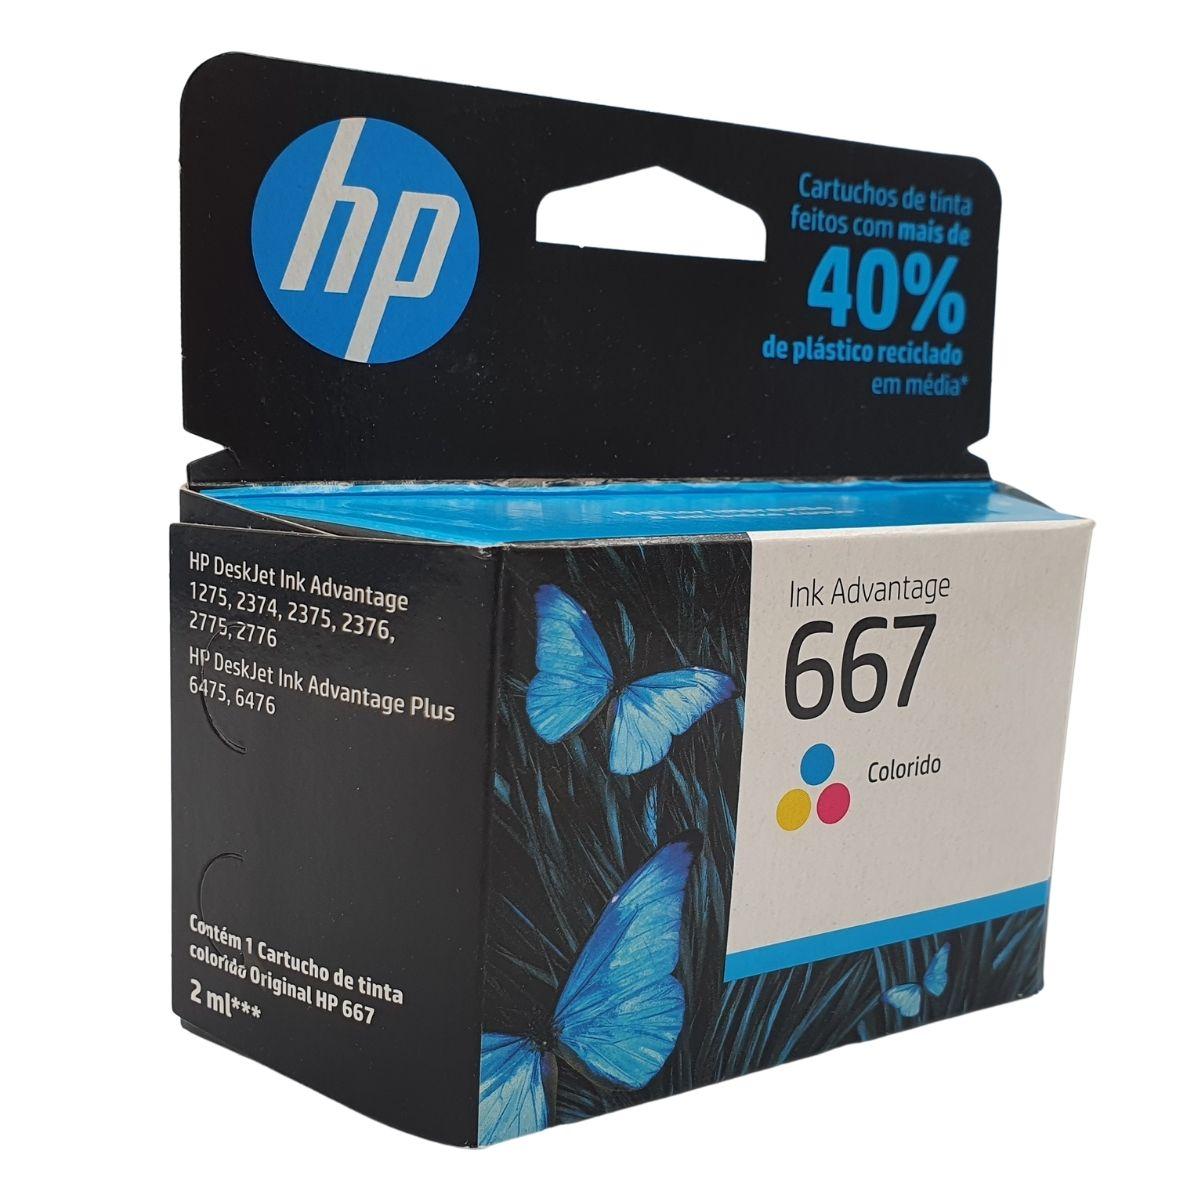 Cartucho HP 667 3YM78AB Color 2ml para 1275 2374 2375 2376 2775 2776 6475 6476